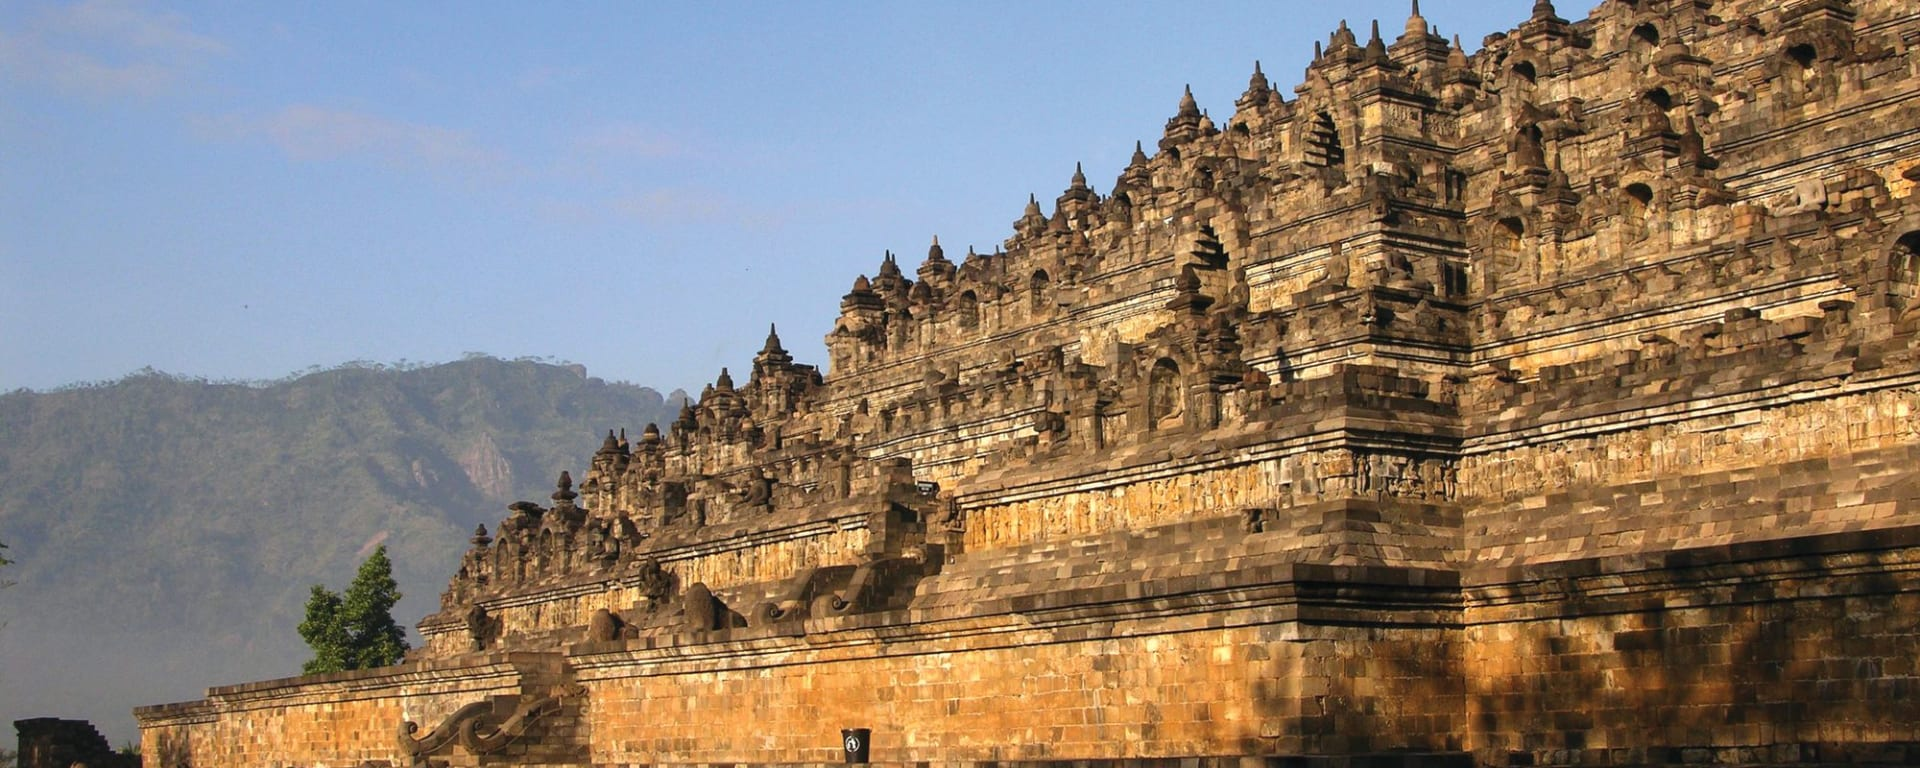 Sonnenaufgang beim Borobudur Tempel in Yogyakarta: Yogyakarta Borobudur